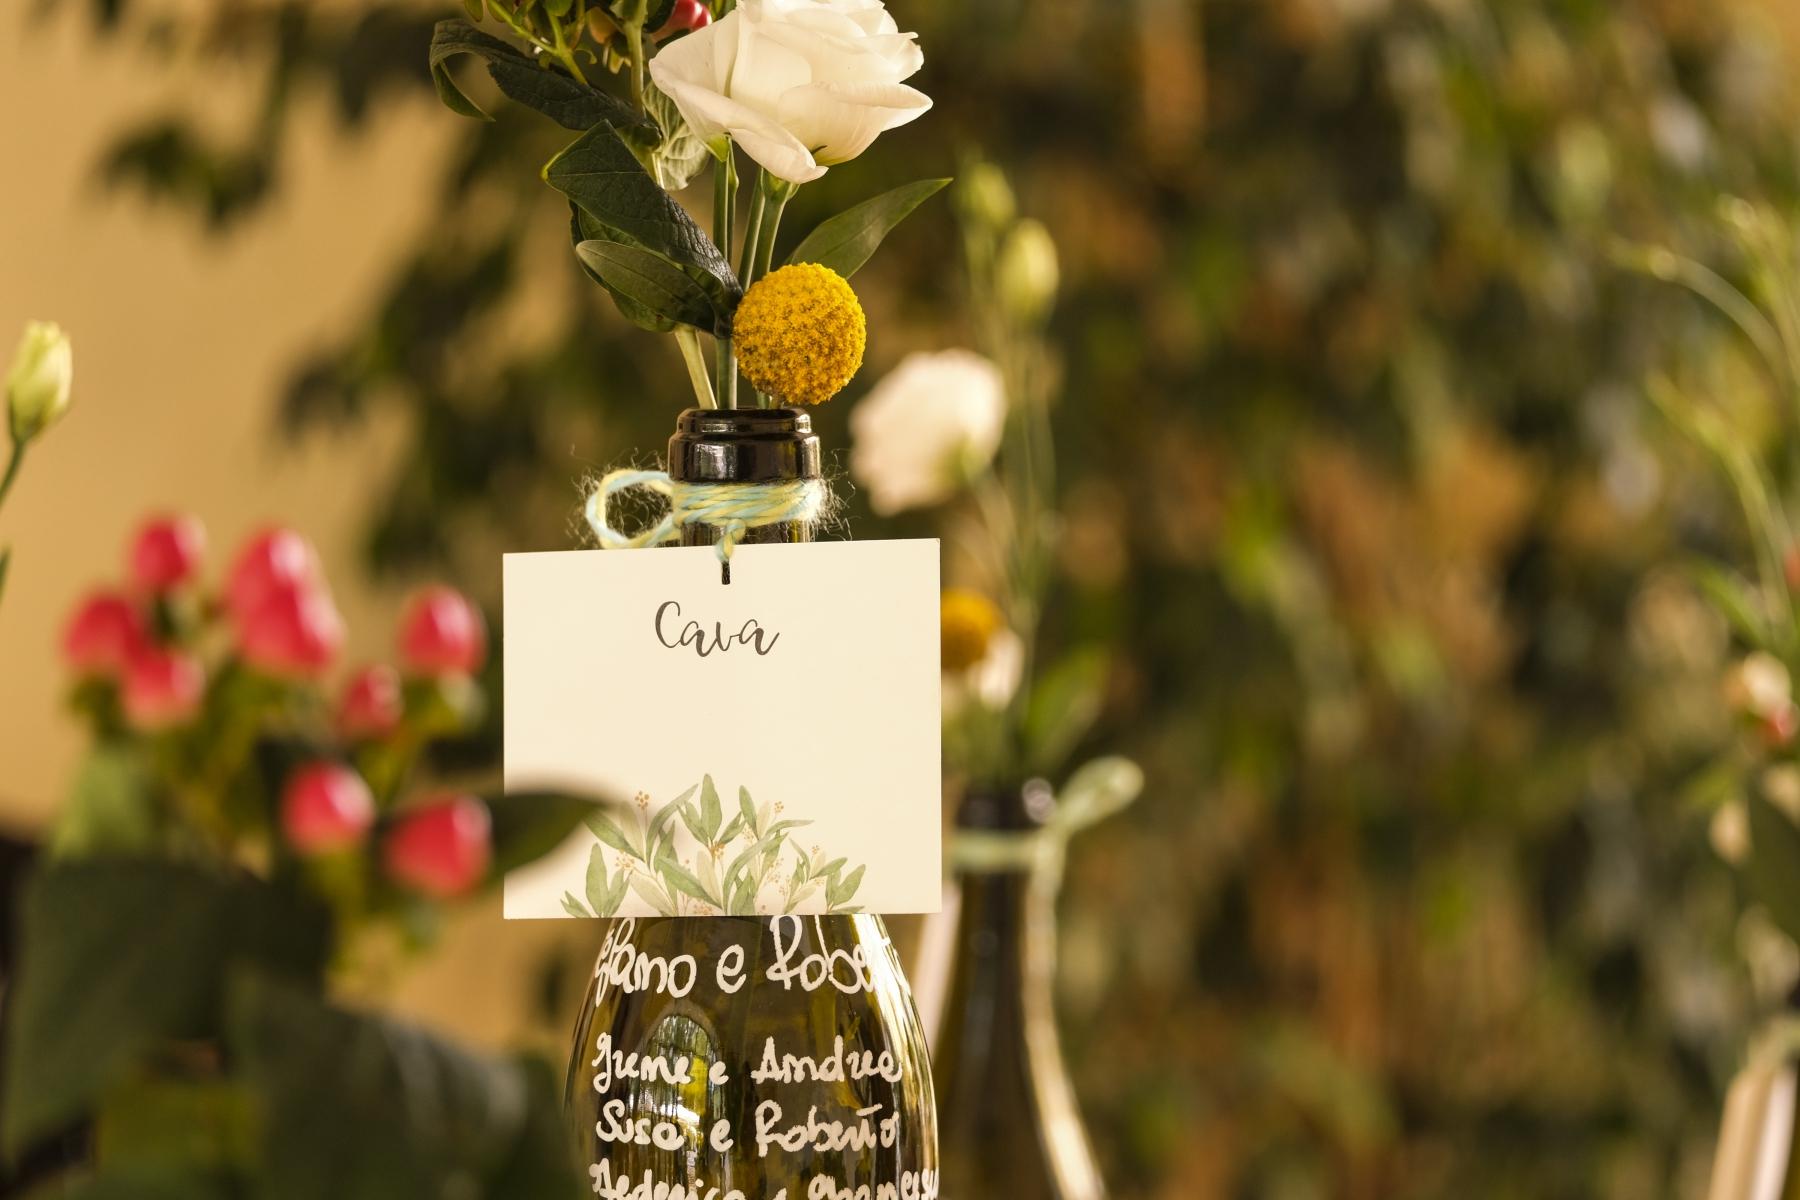 matrimonioincampagna_casalerario_blineventi-6